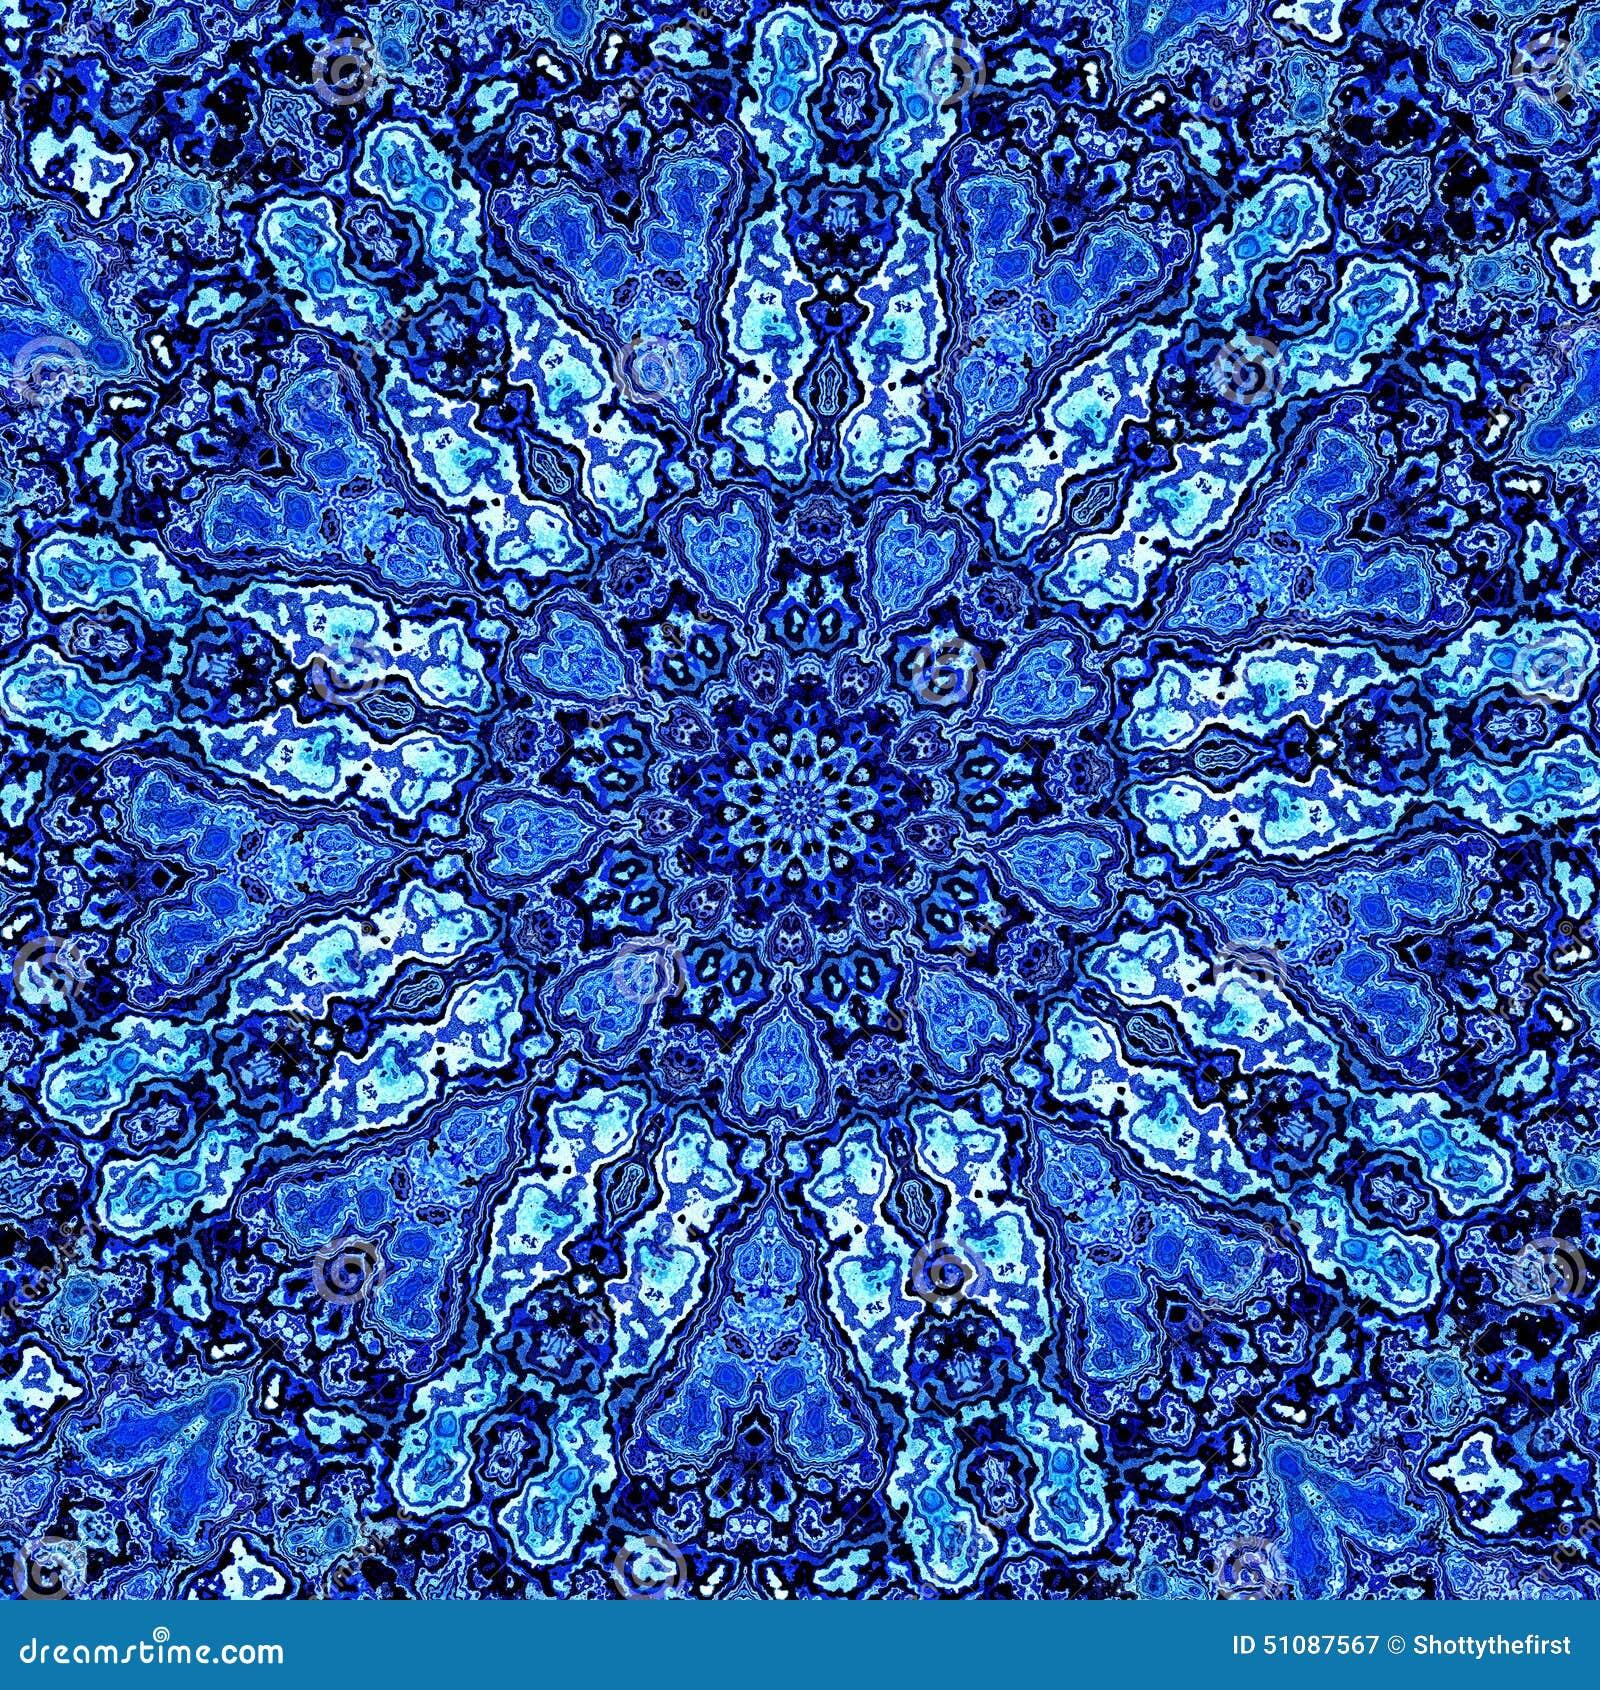 Beautiful Detailed Blue Mandala Fractal. Abstract